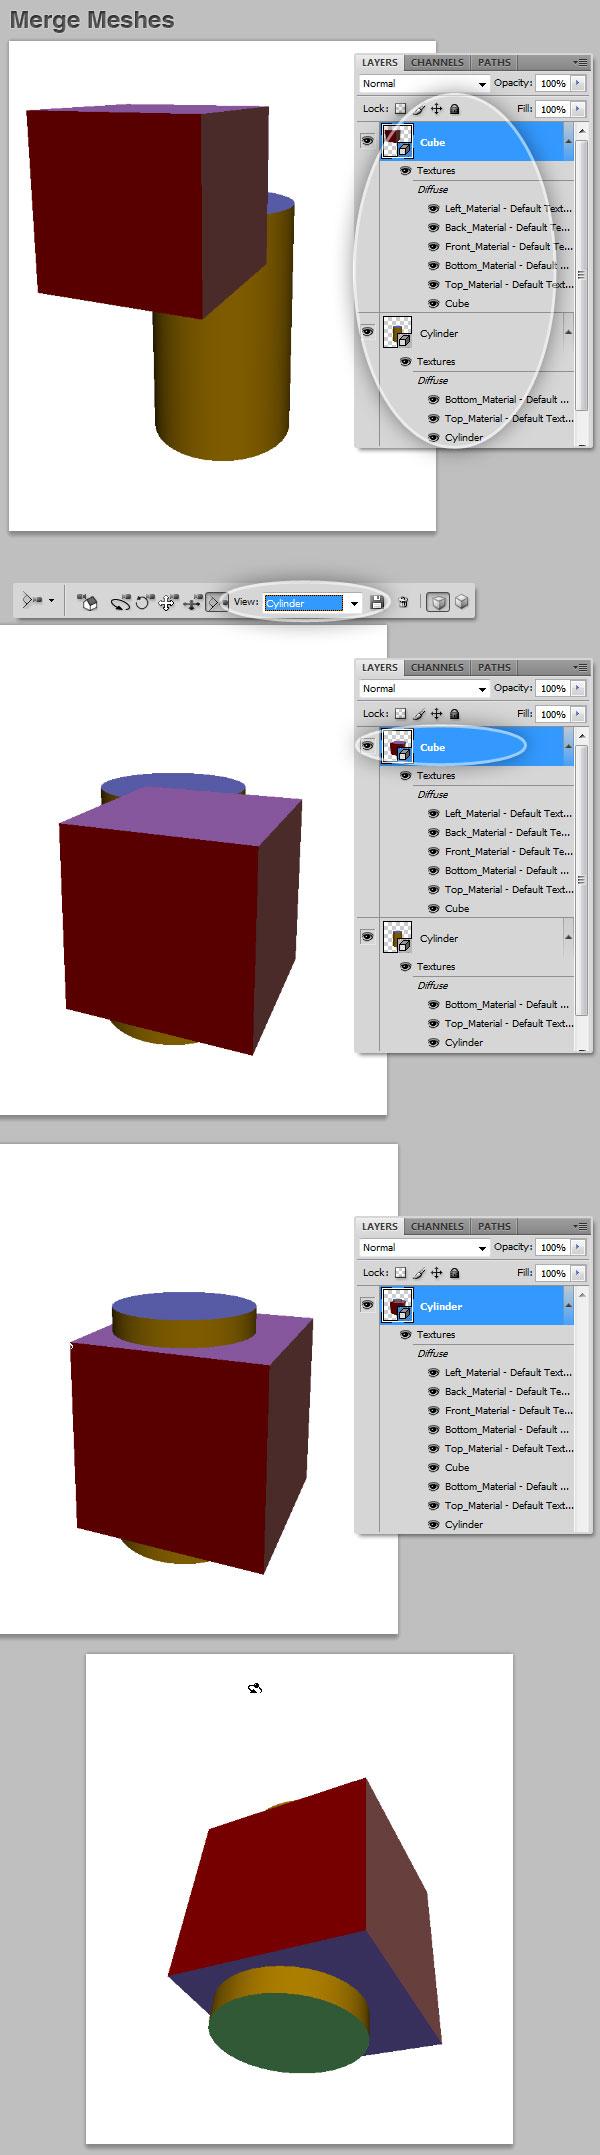 3D merge meshes